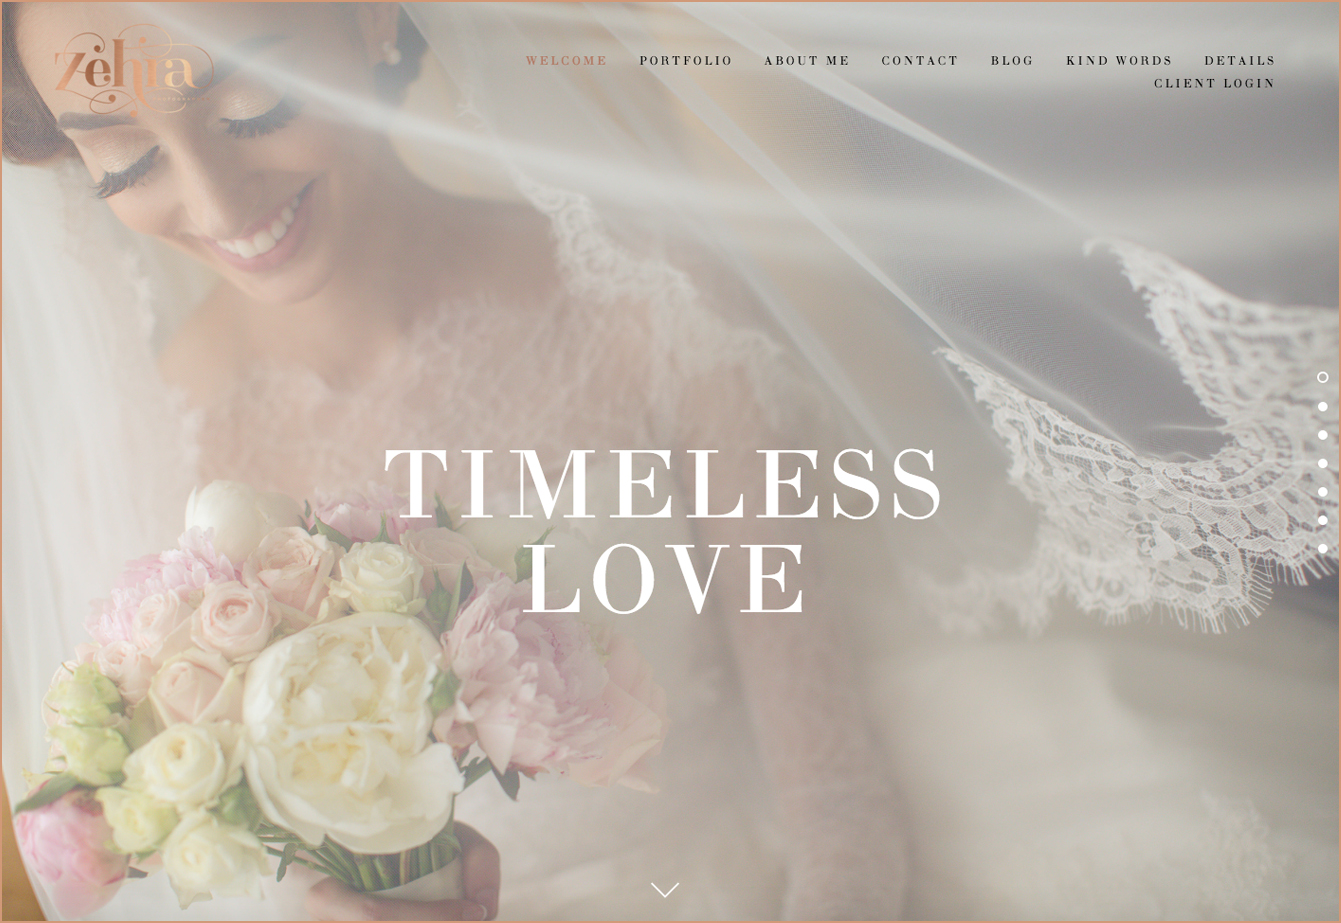 The fresh new website